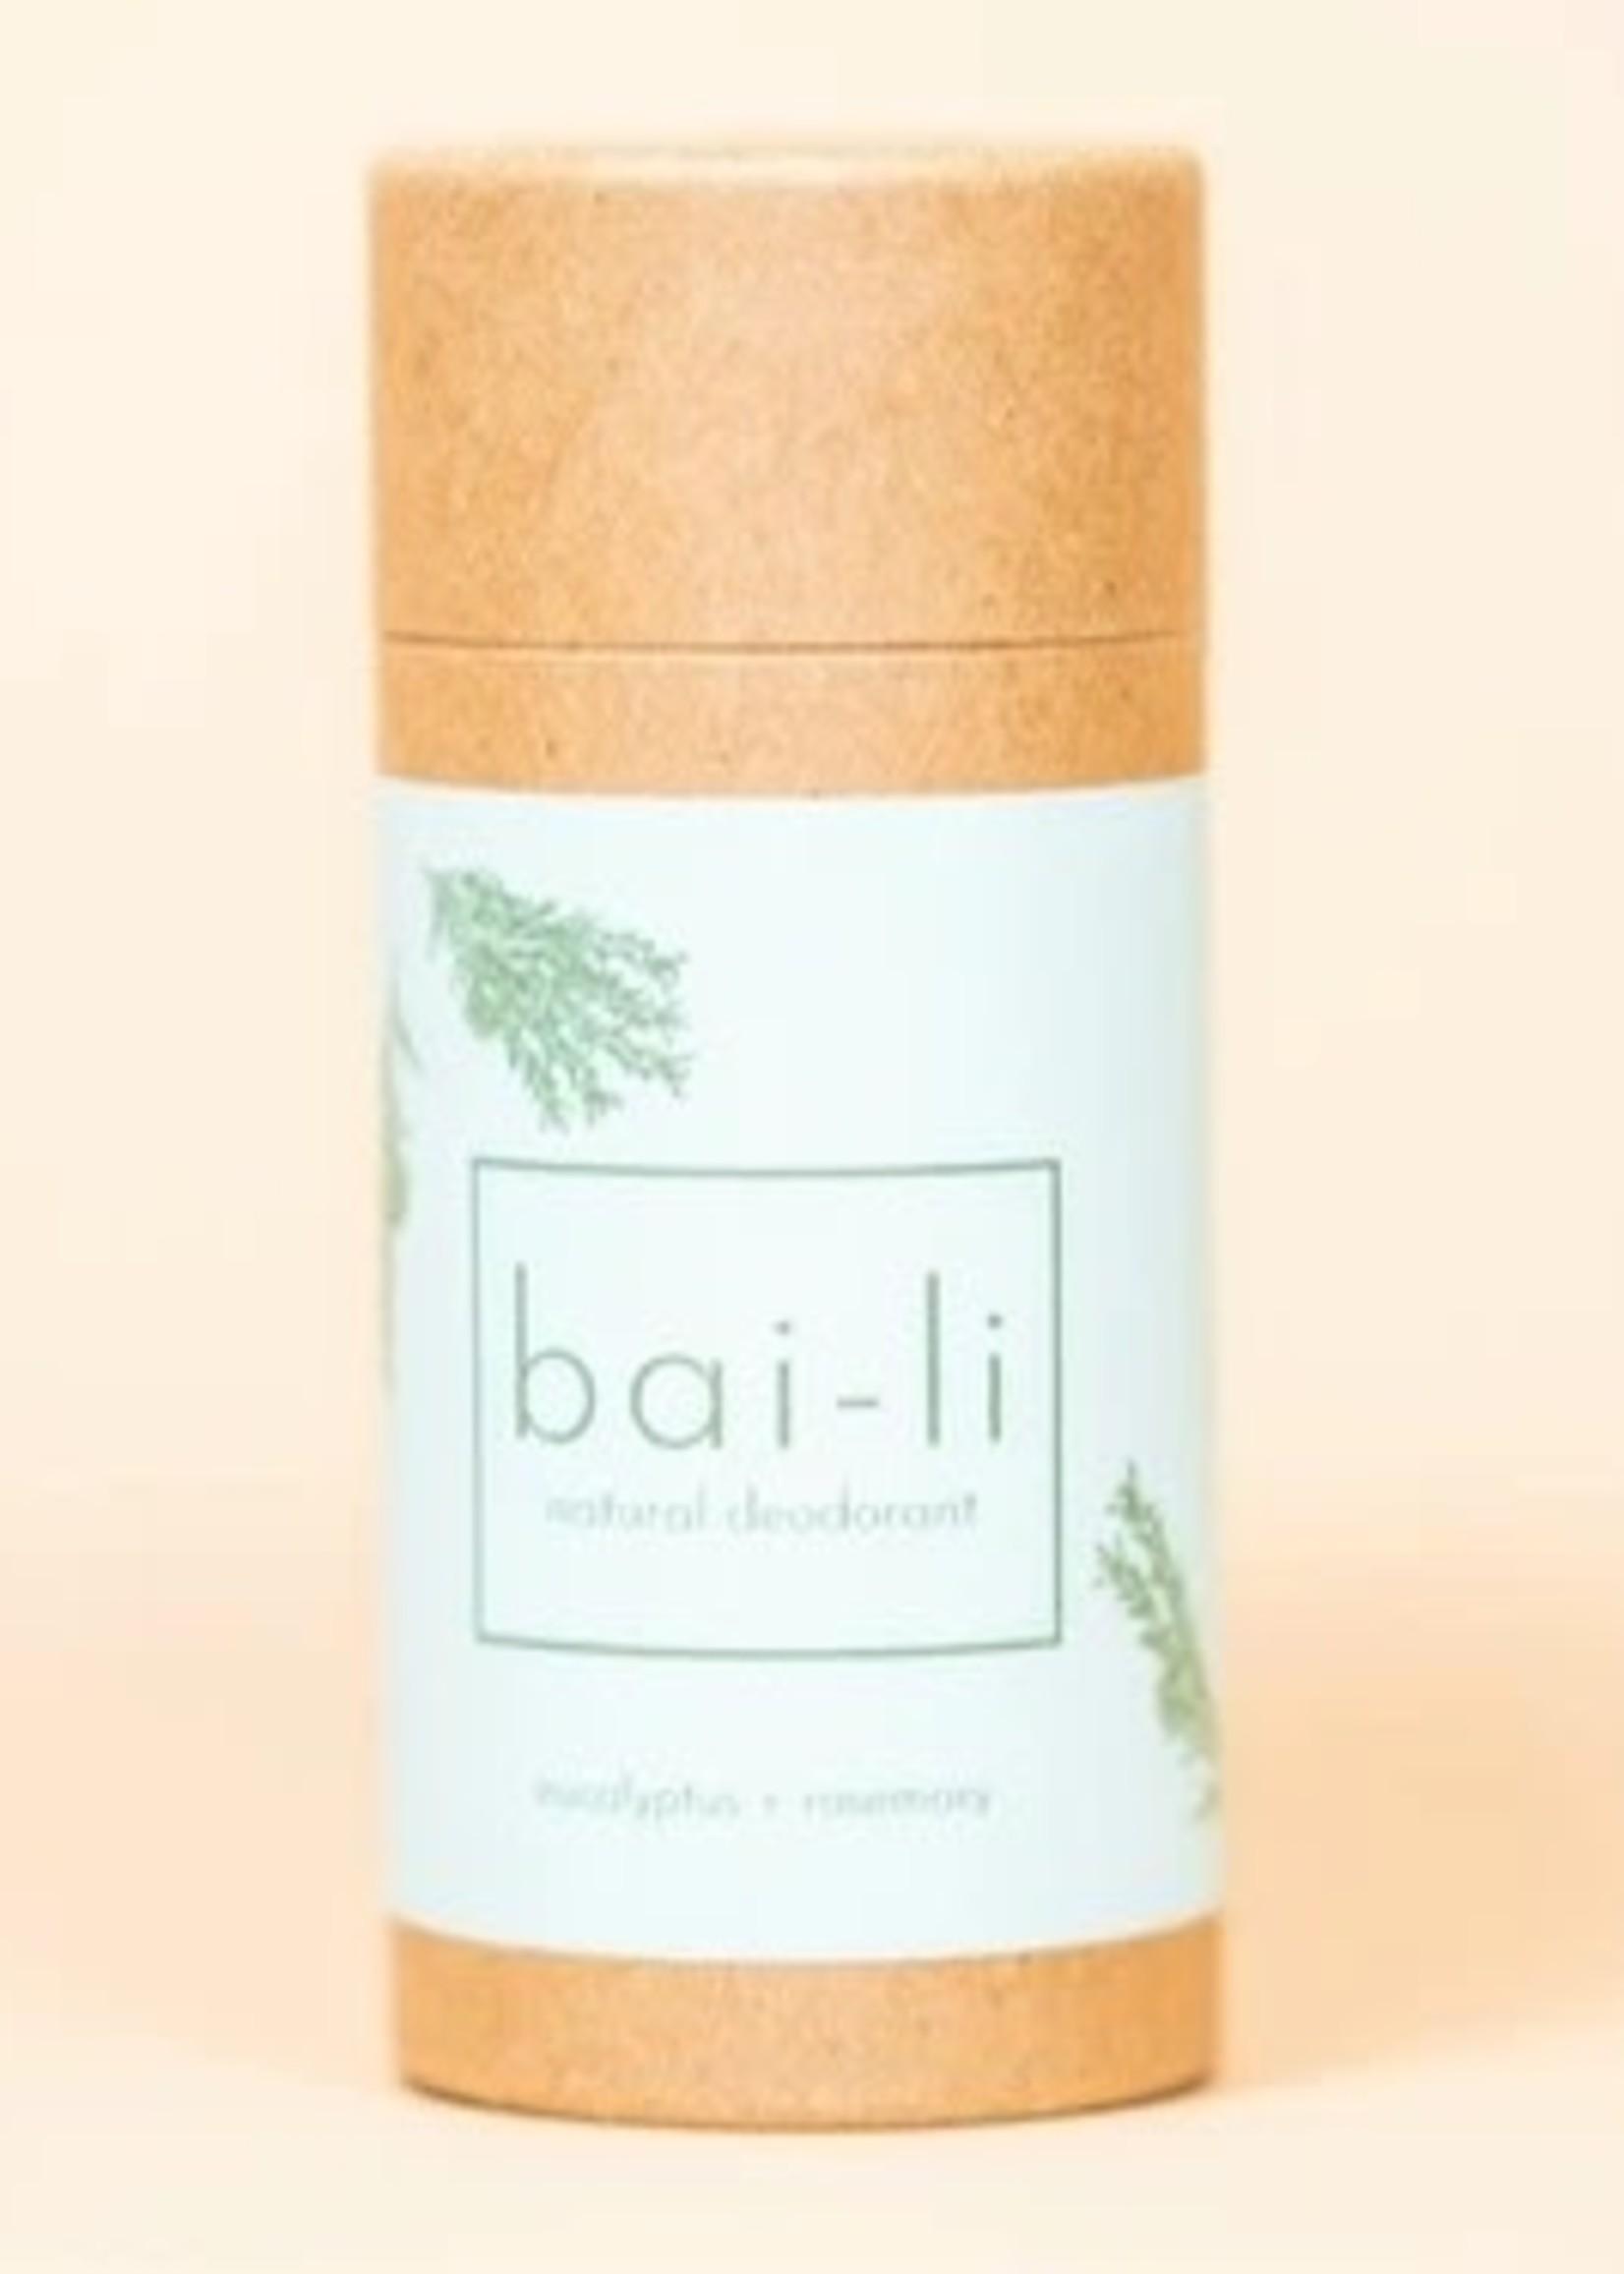 Bai-li Eucalyptus Rosemary Deodorant